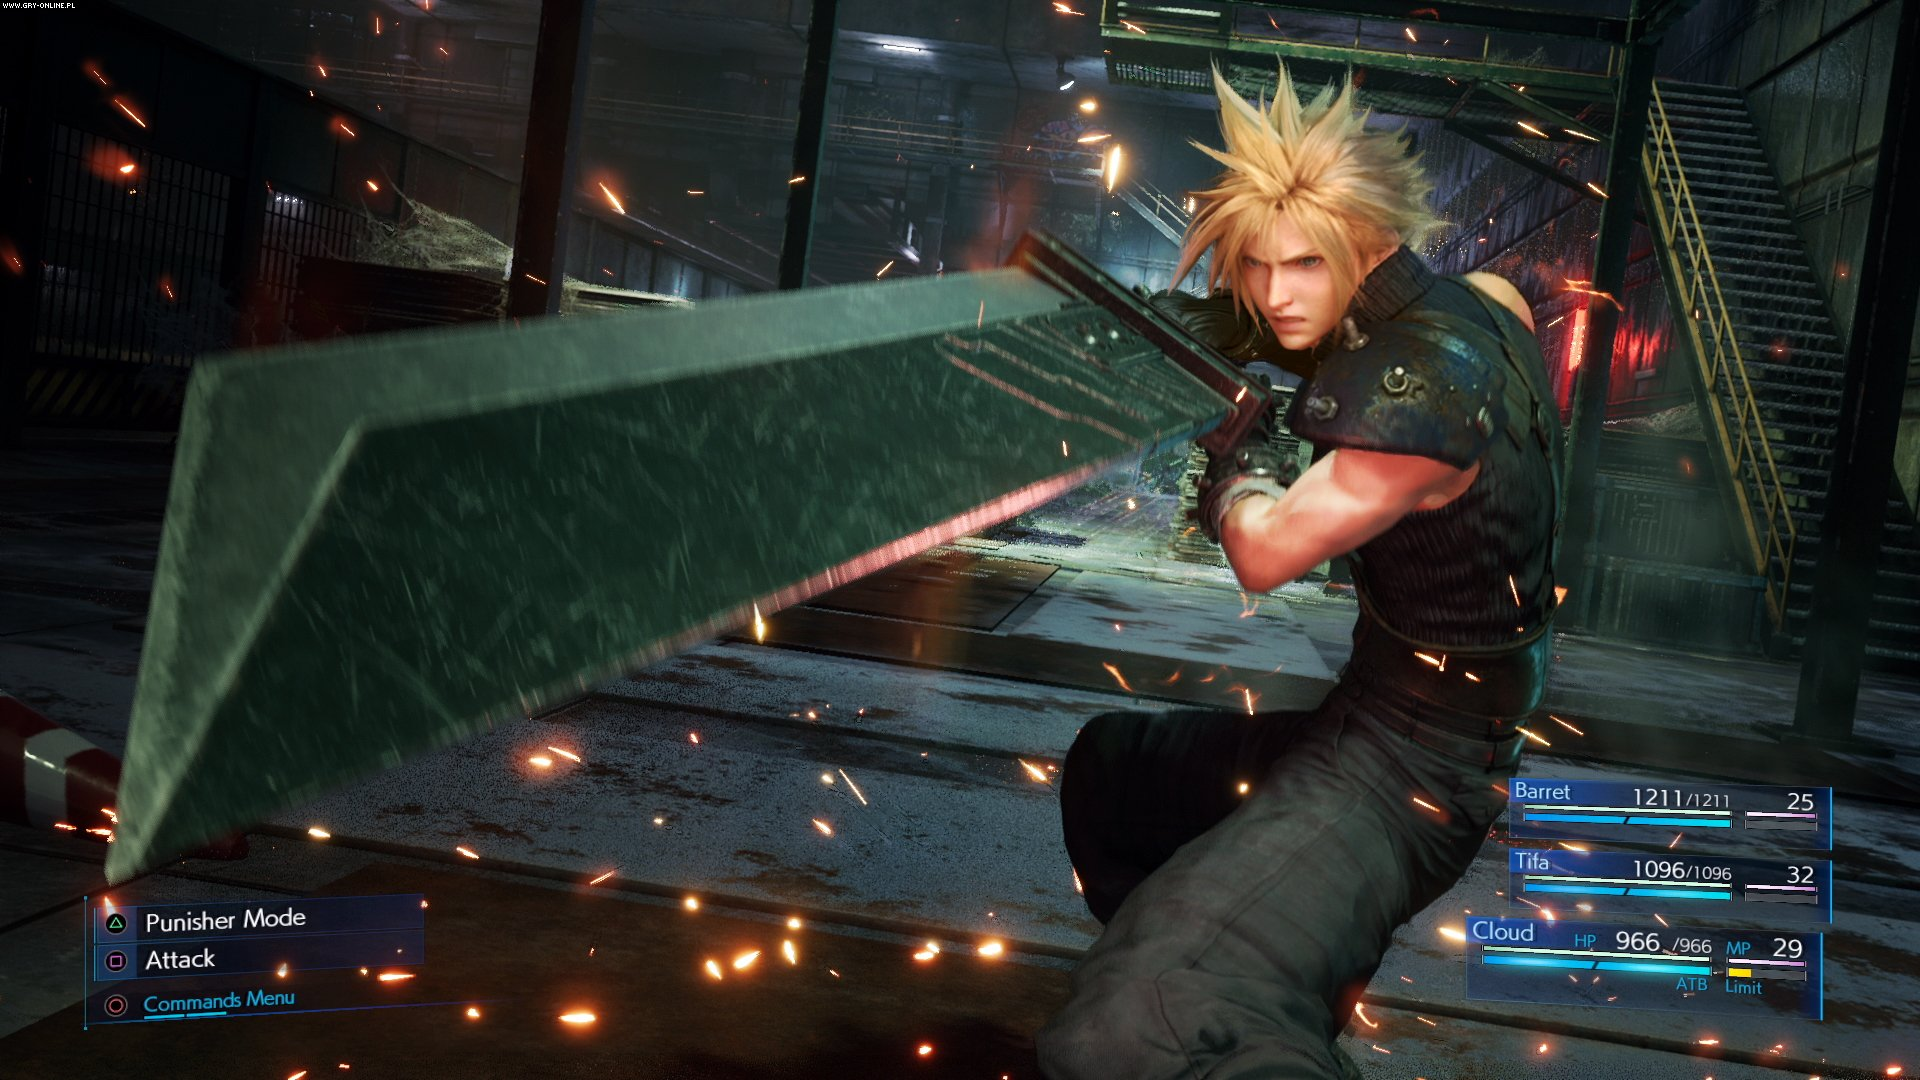 Final Fantasy VII Remake PS4 Games Image 2/28, Square-Enix / Eidos